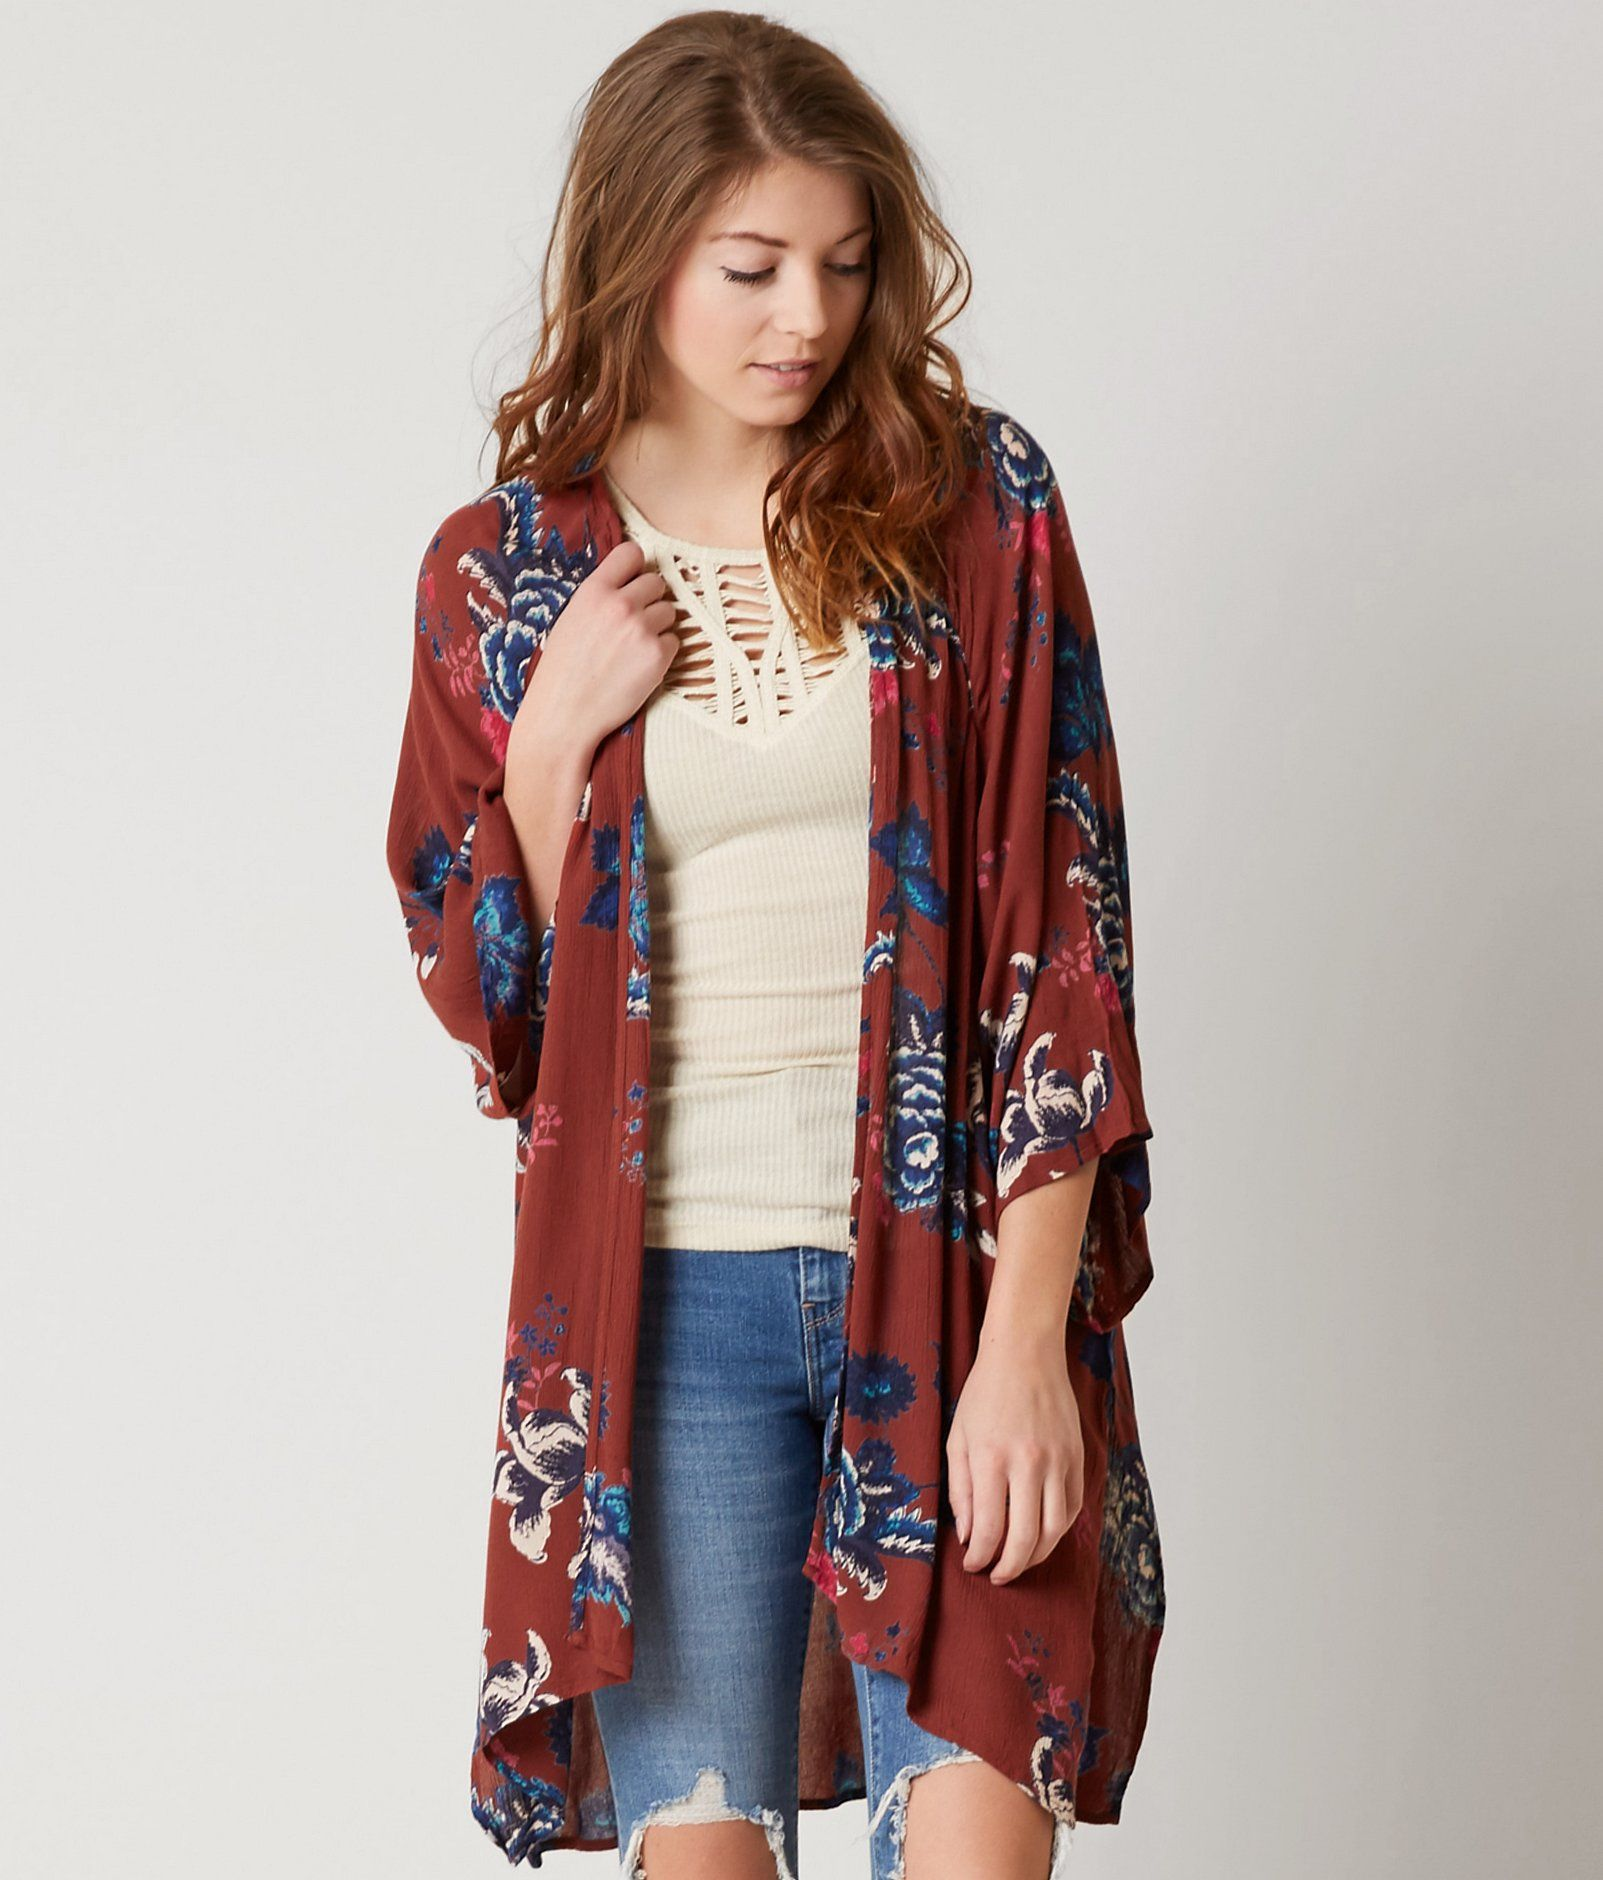 Kimono cardigan (but not sooo long) with long shorts (but the ...